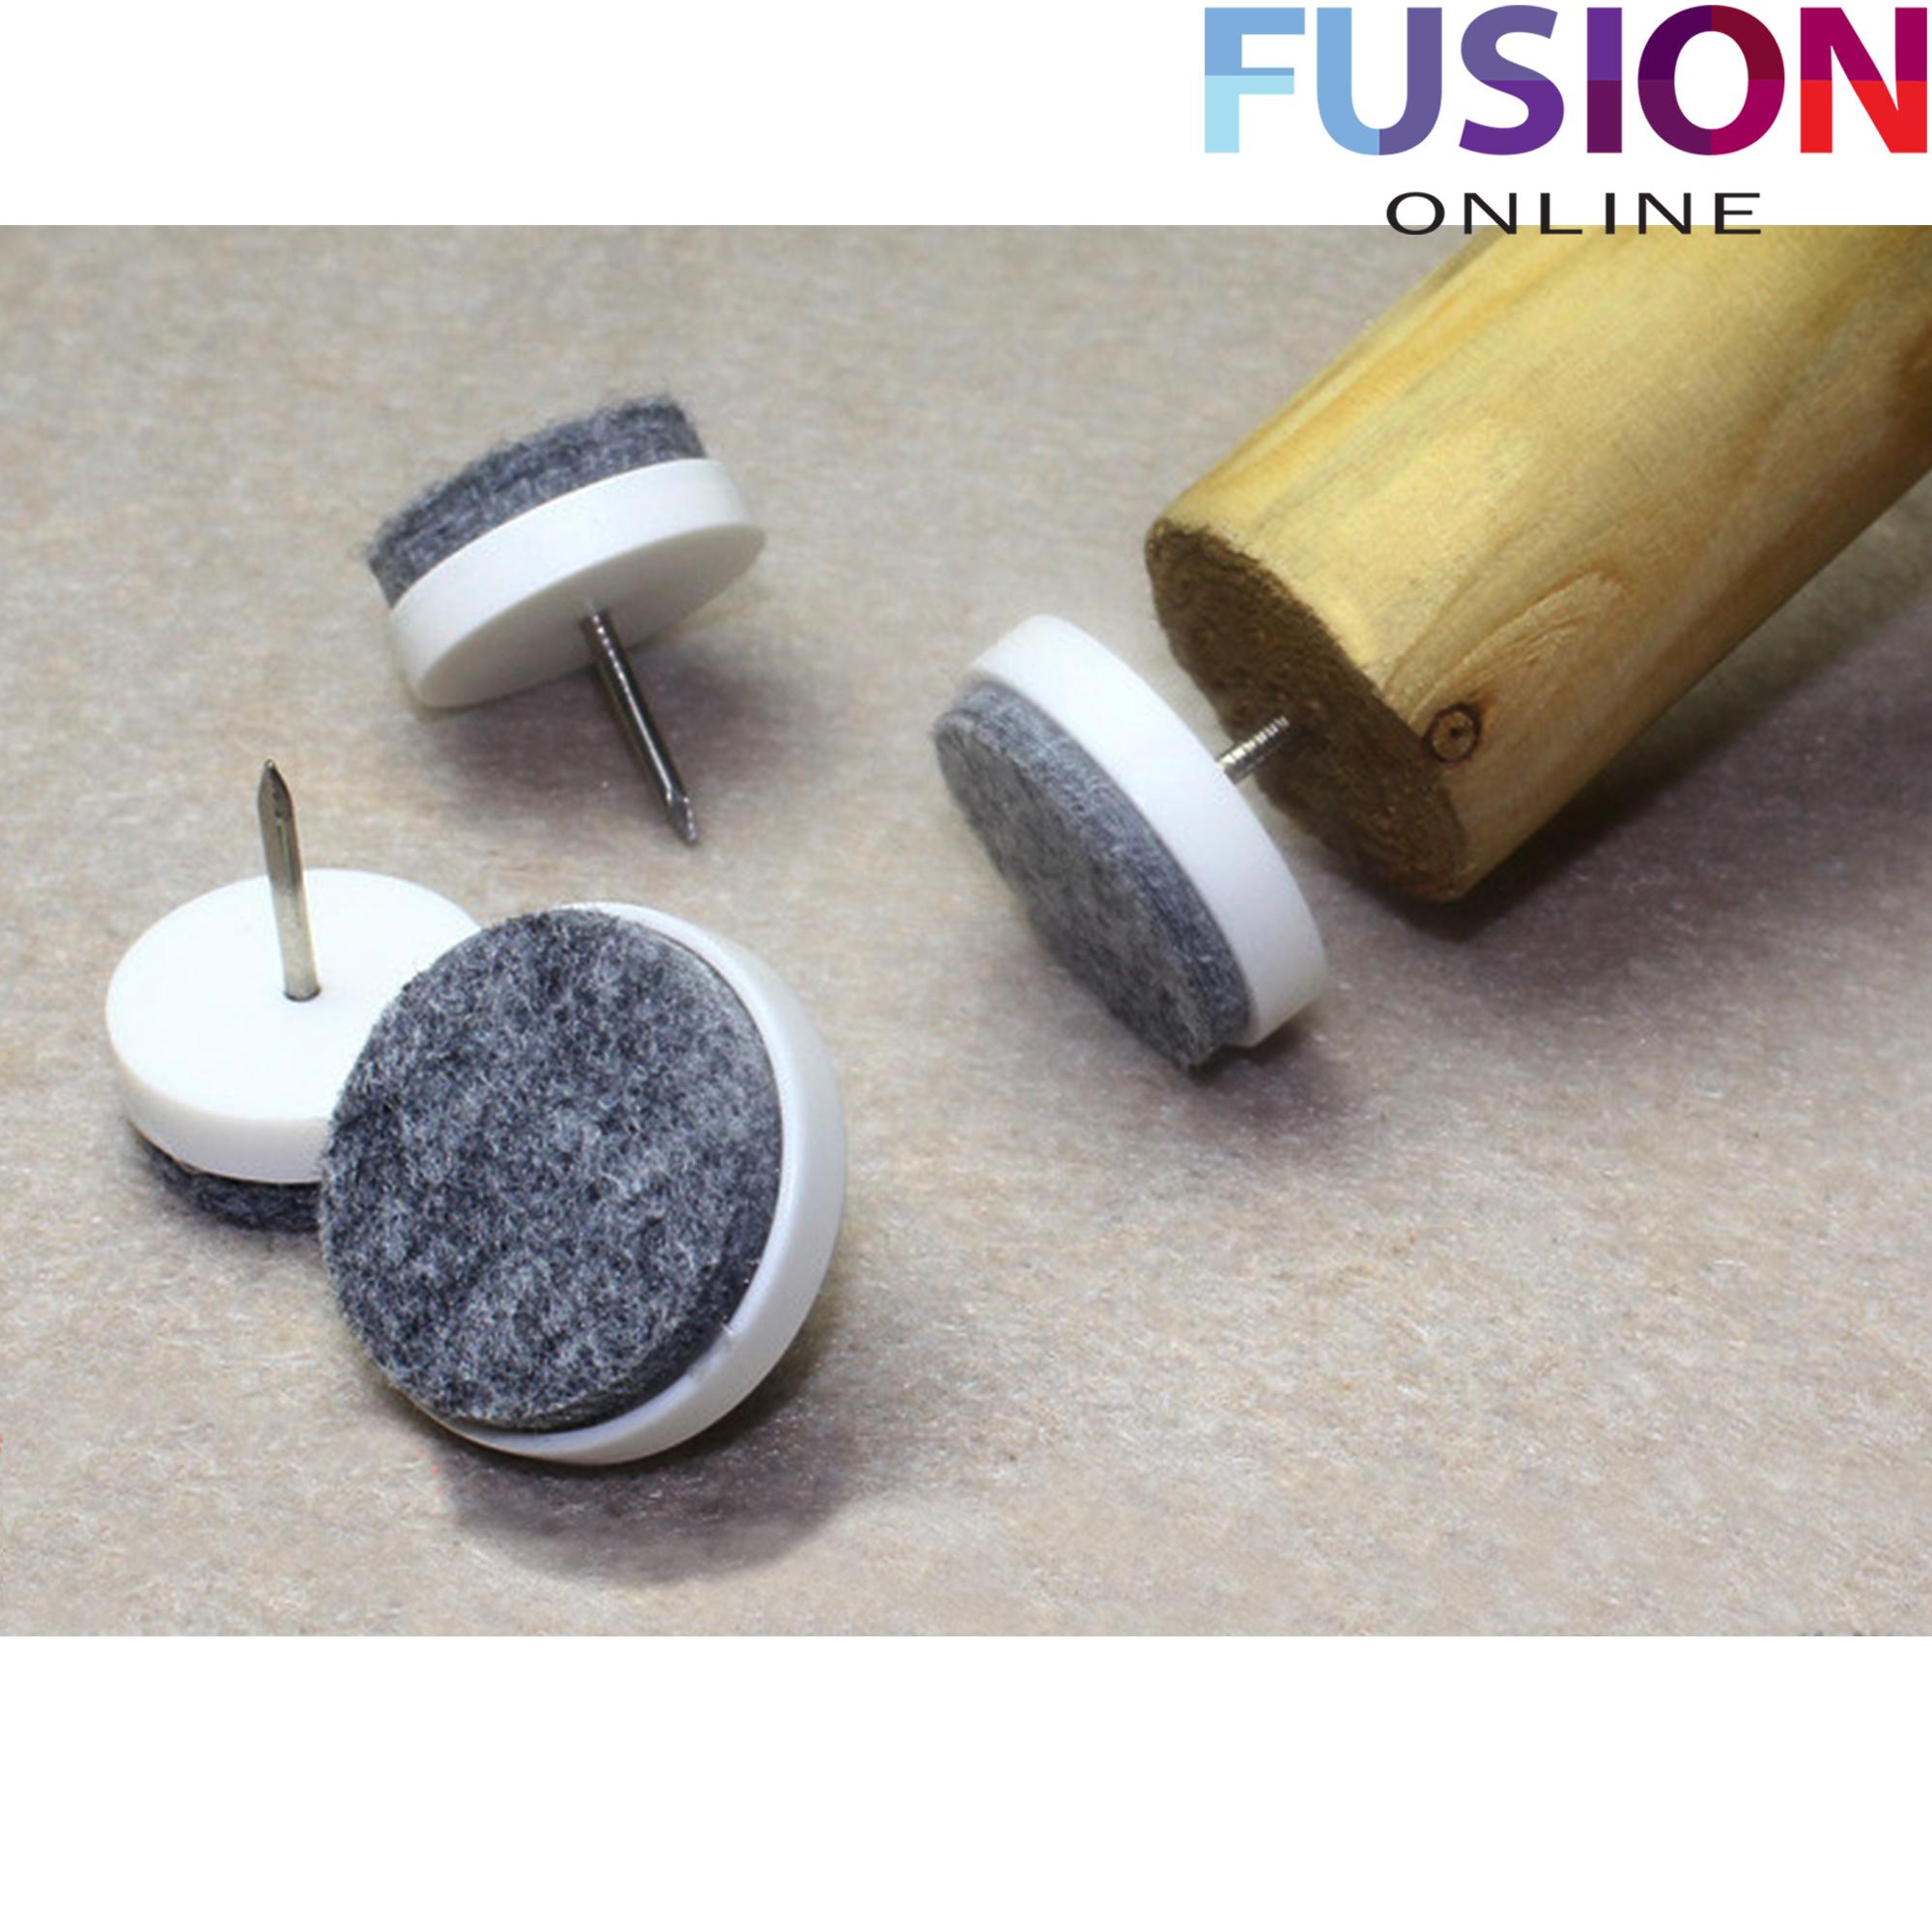 Felt Floor Protectors Nail In Anti Skid Furniture Pads Leg